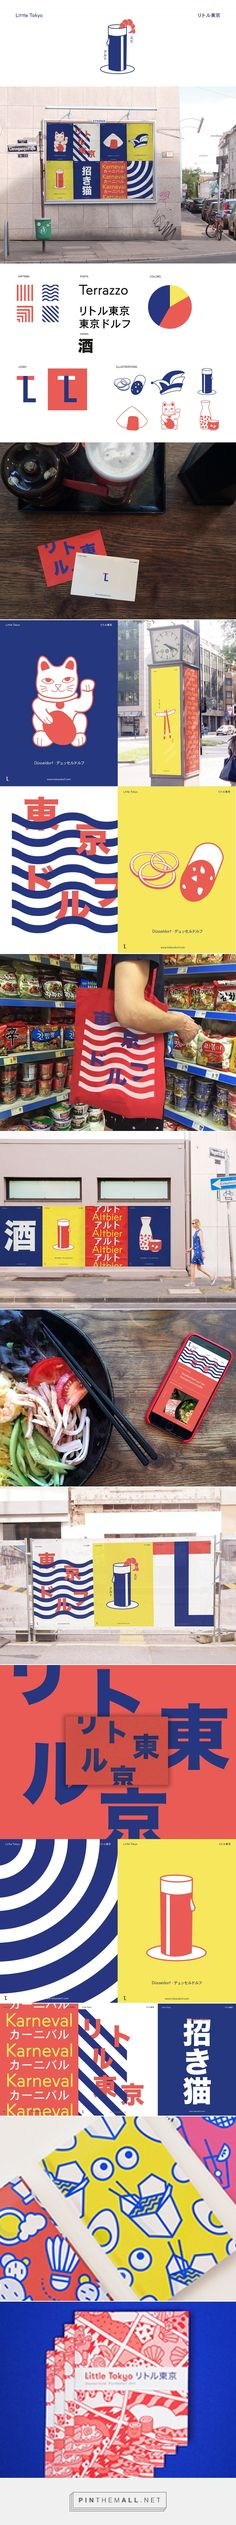 Identity for Düsseldorf's Japanese quarter on Behance. - a grouped images picture - Pin Them All Brand Identity Design, Graphic Design Branding, Corporate Design, Packaging Design, Logo Design, Corporate Identity, Visual Identity, Japanese Branding, Restaurant Logo